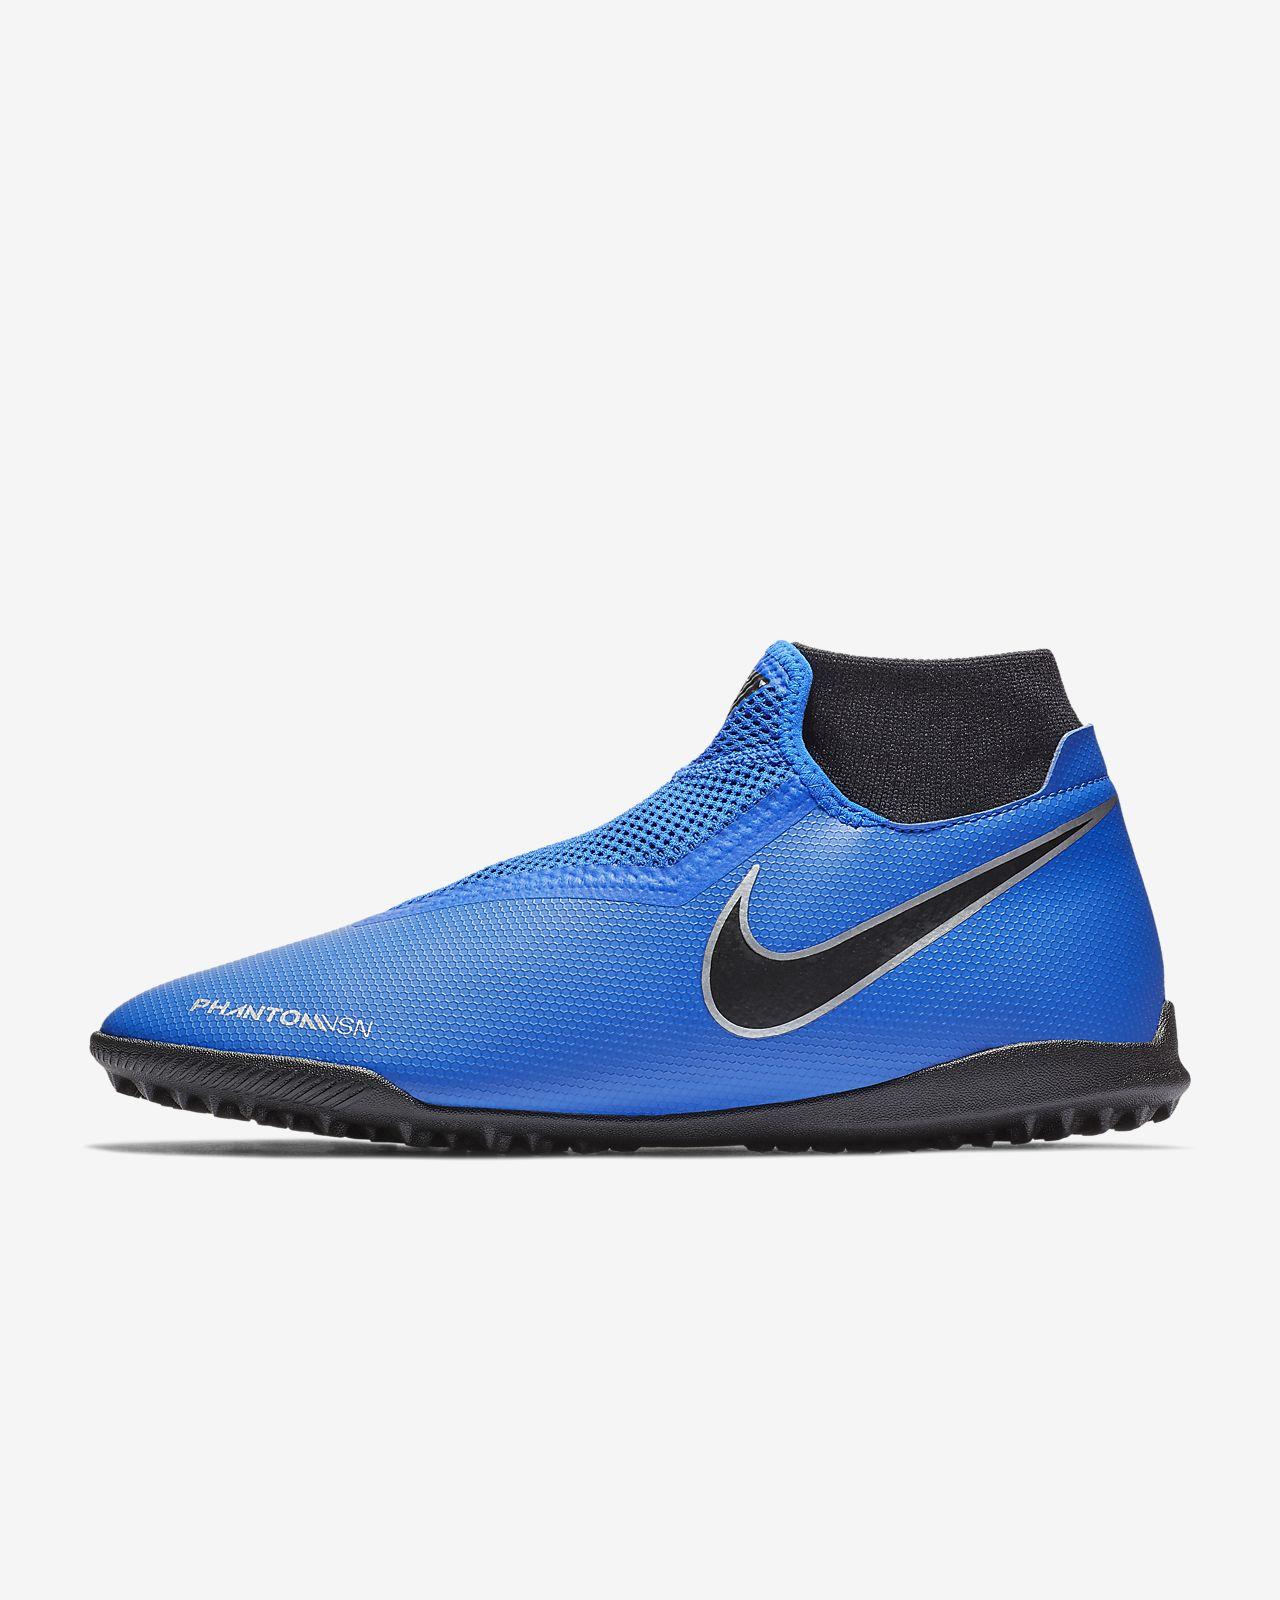 Calzado de fútbol para terreno artificial Nike Phantom Vision Academy Dynamic Fit